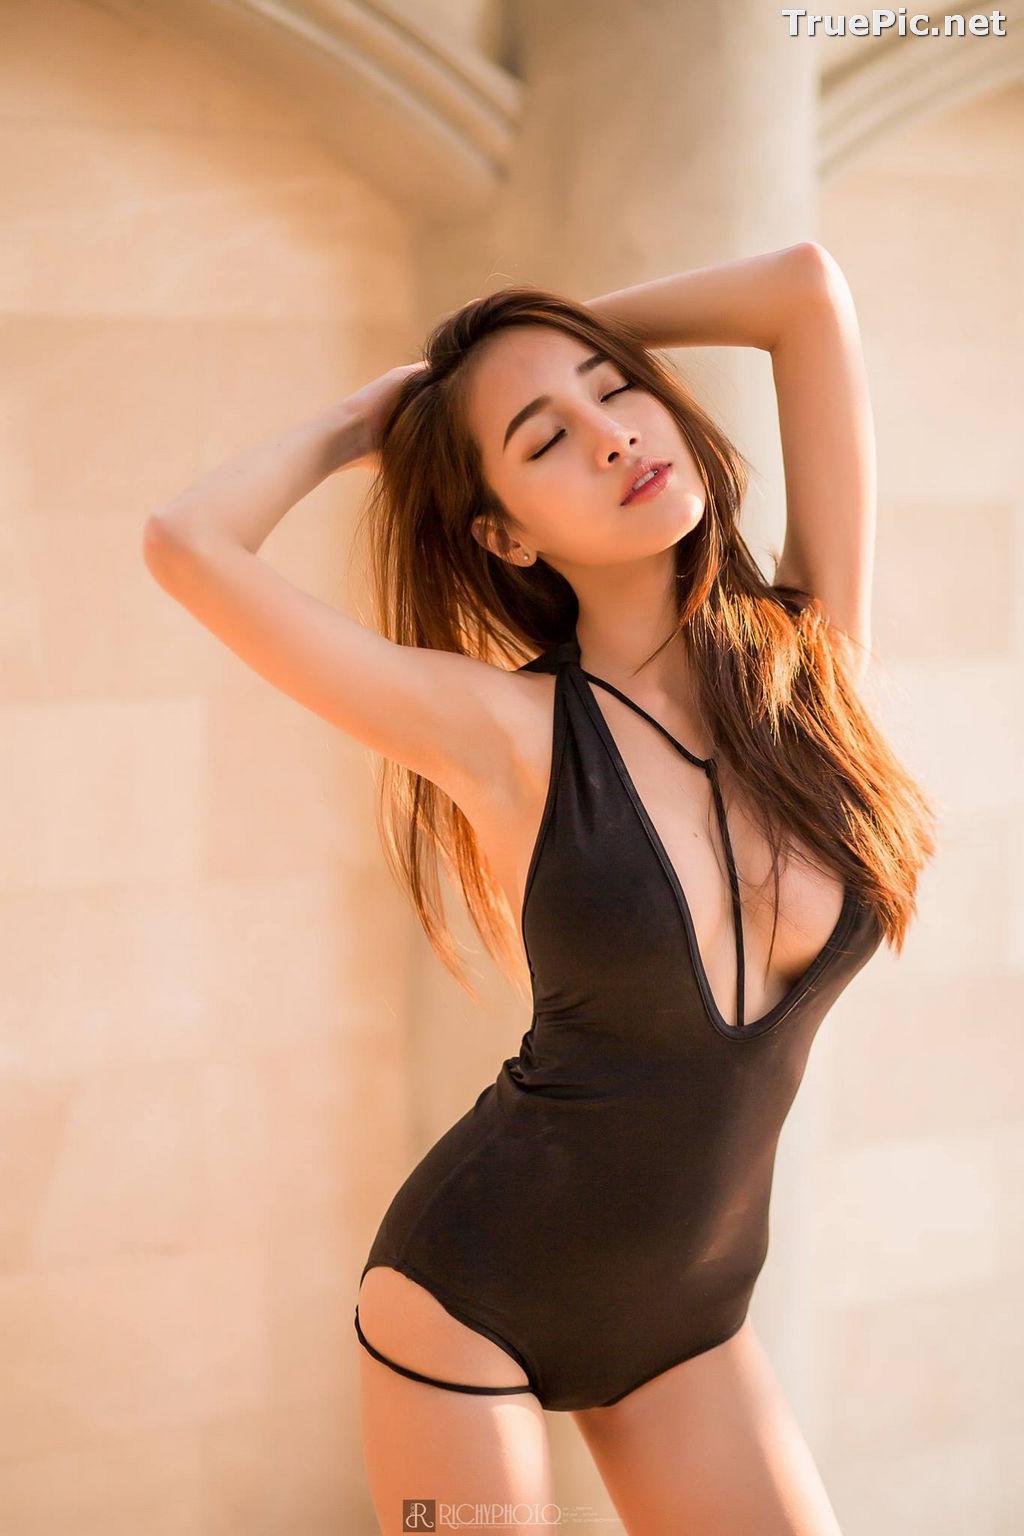 Image Thailand Model - Pichana Yoosuk - Black One Piece Swimsuit - TruePic.net - Picture-7